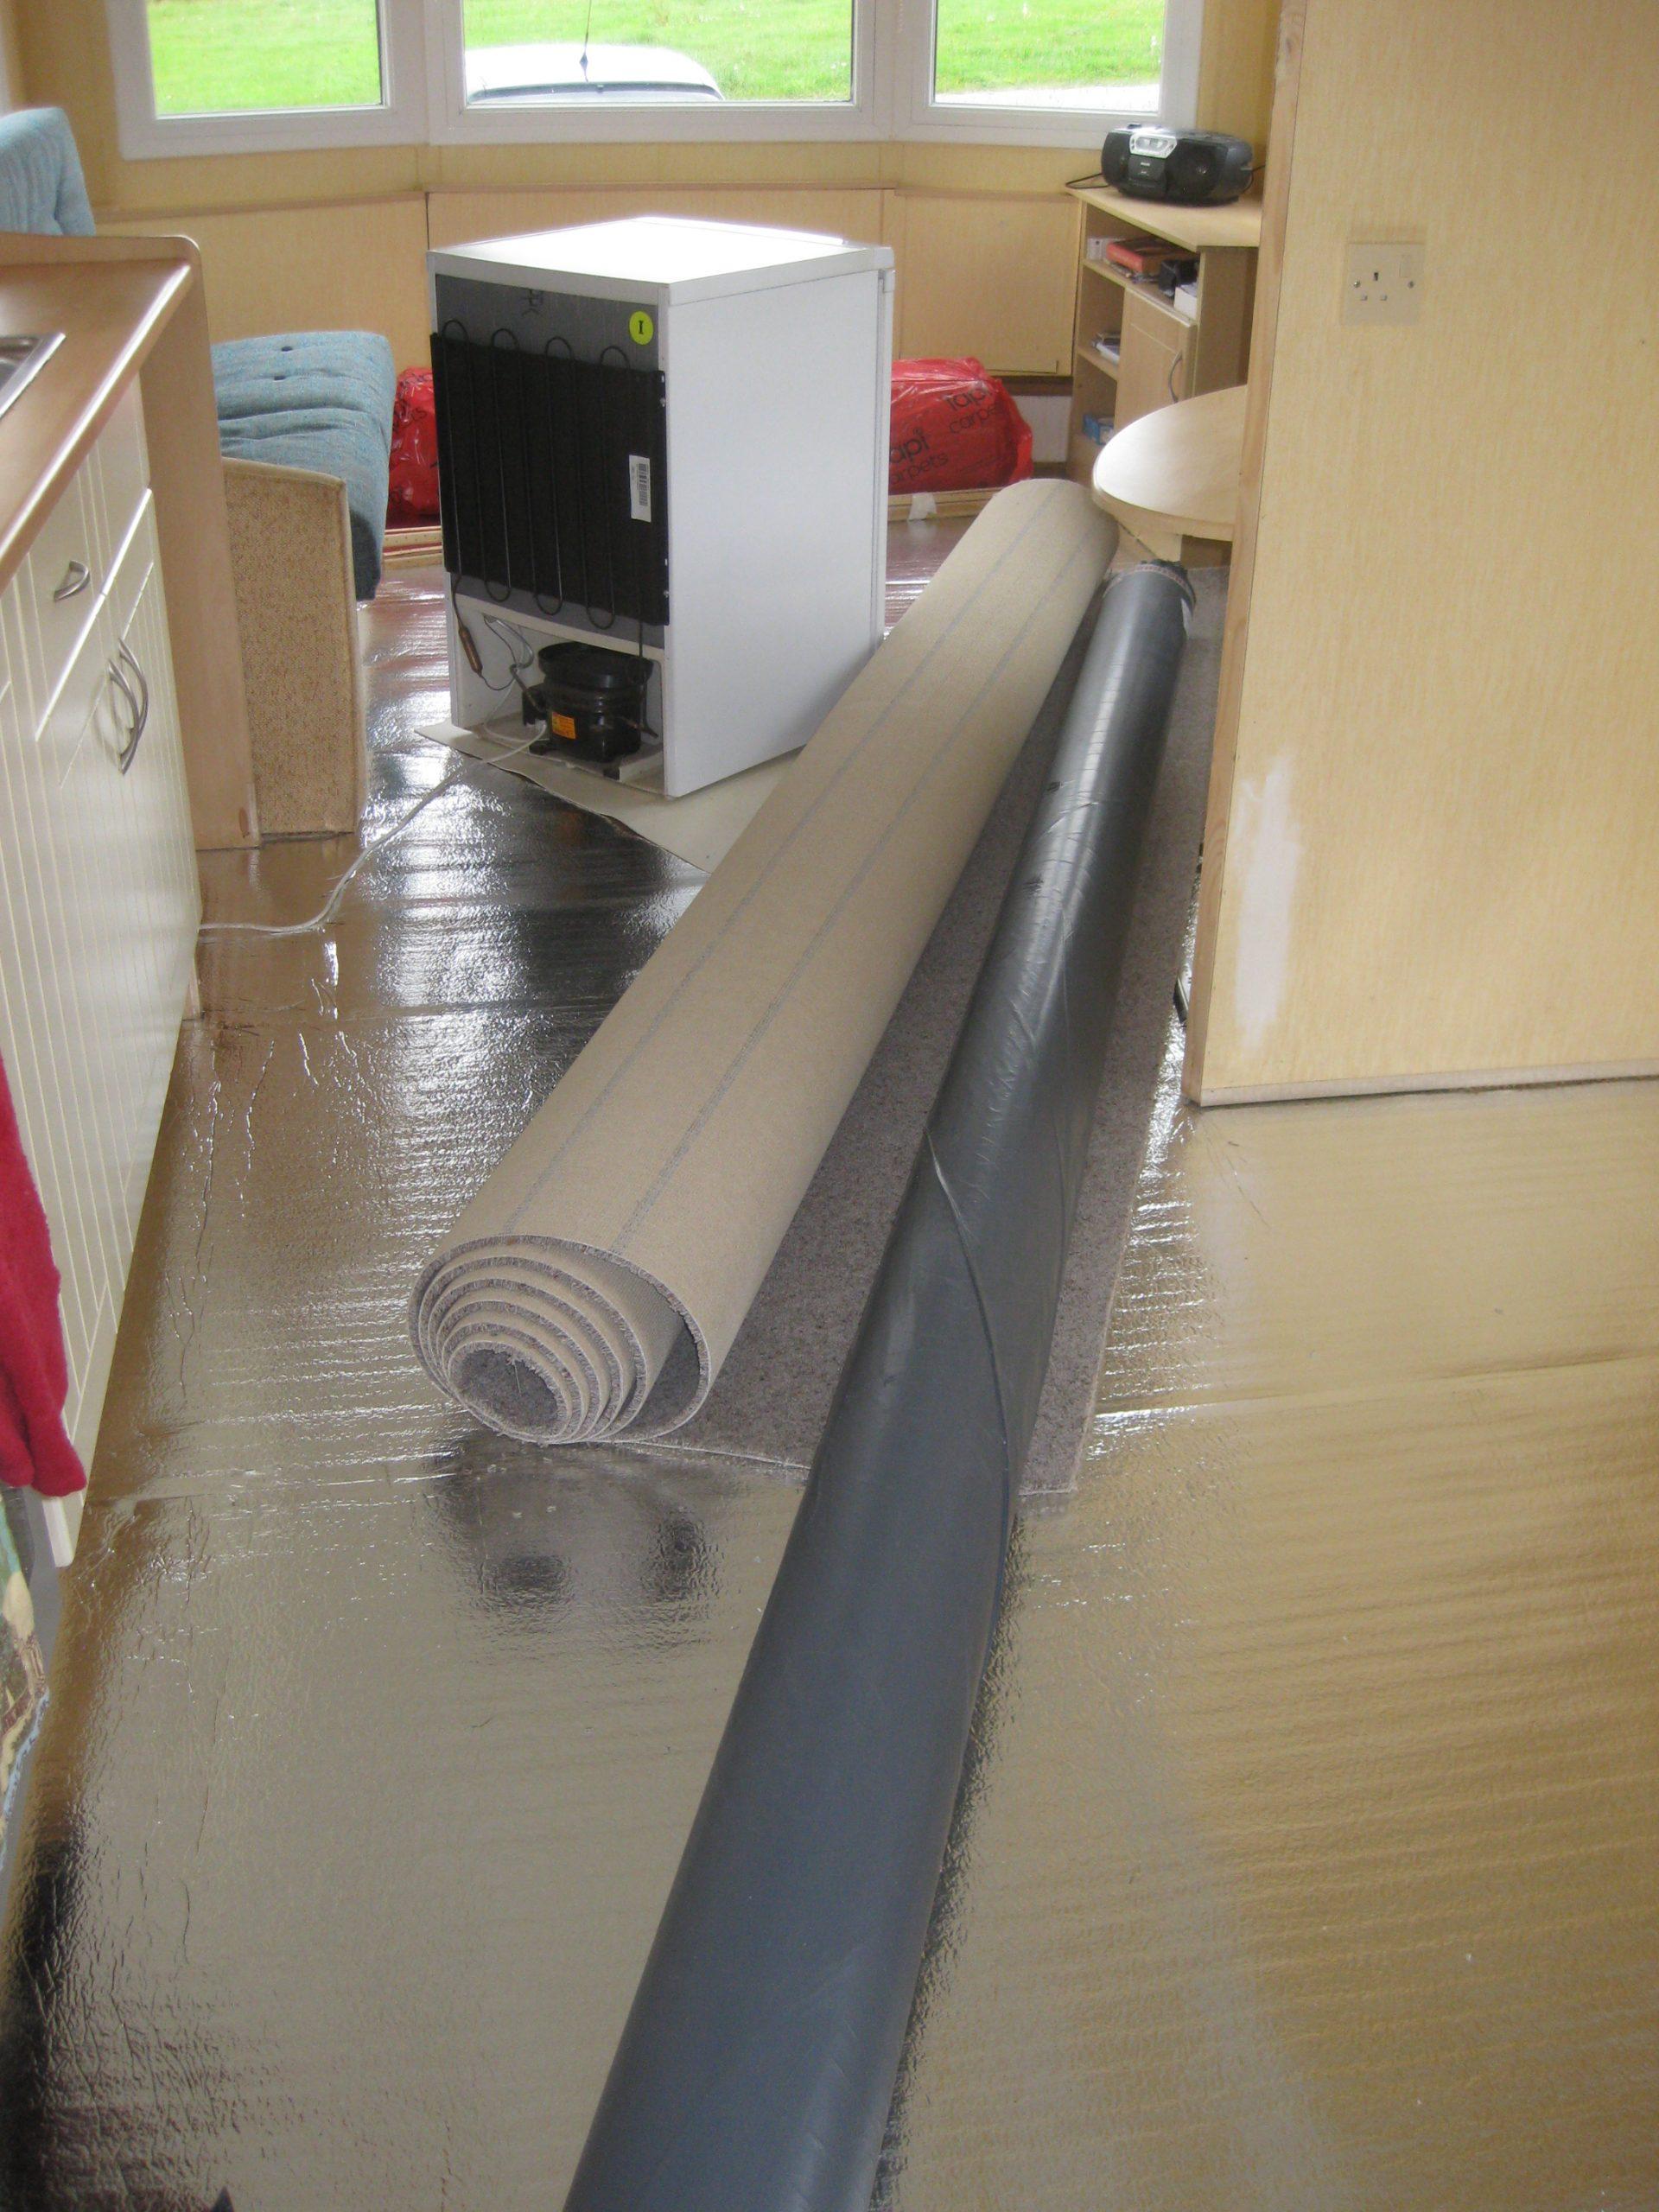 Foil and carpet